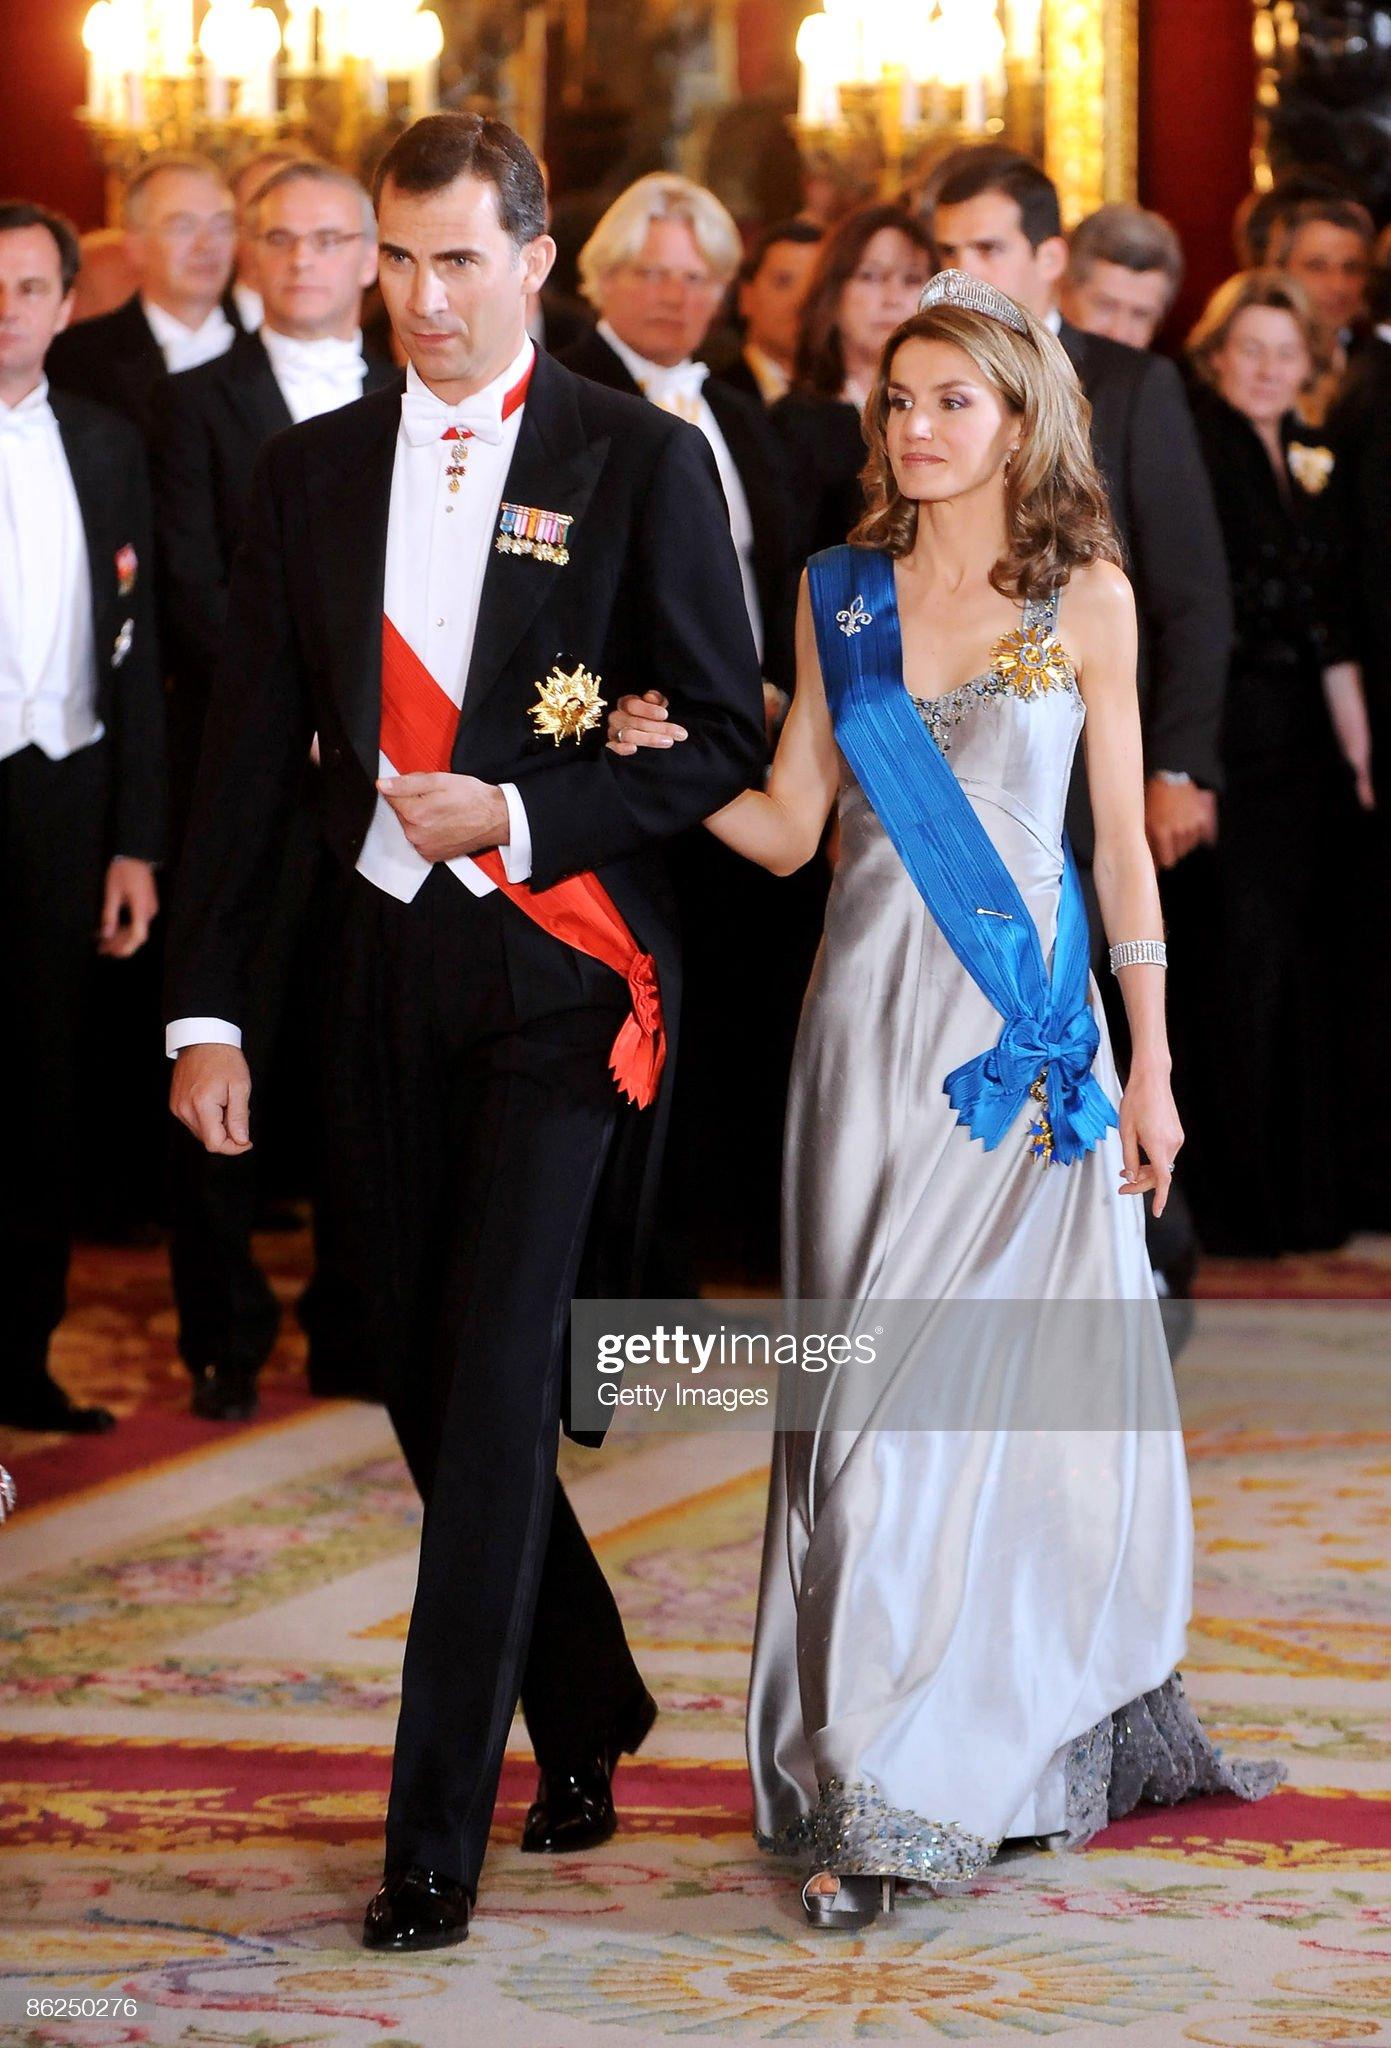 Spanish Royals Host Gala Dinner Honouring Nicolas Sarkozy & Carla Bruni : News Photo